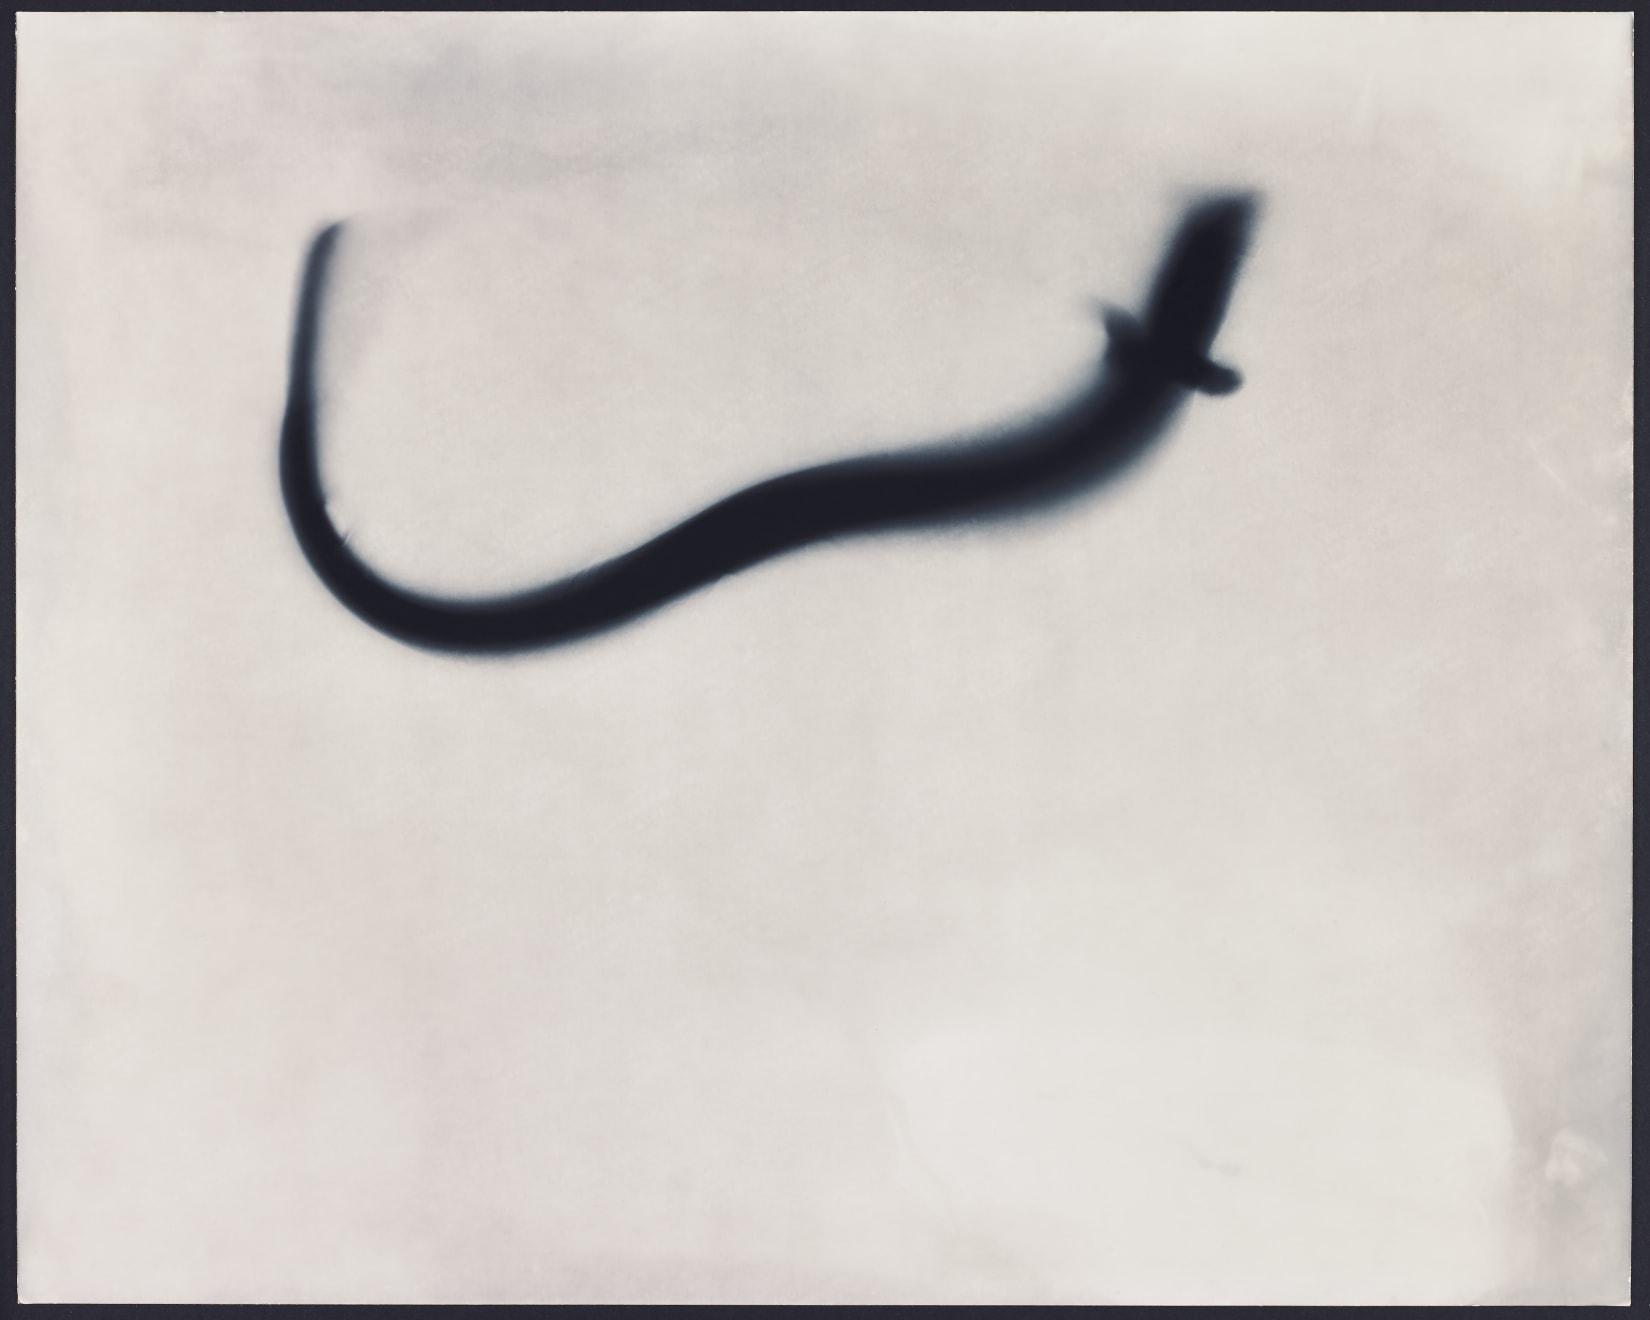 Kunié Sugiura, Eel Study Positive AP, 1997